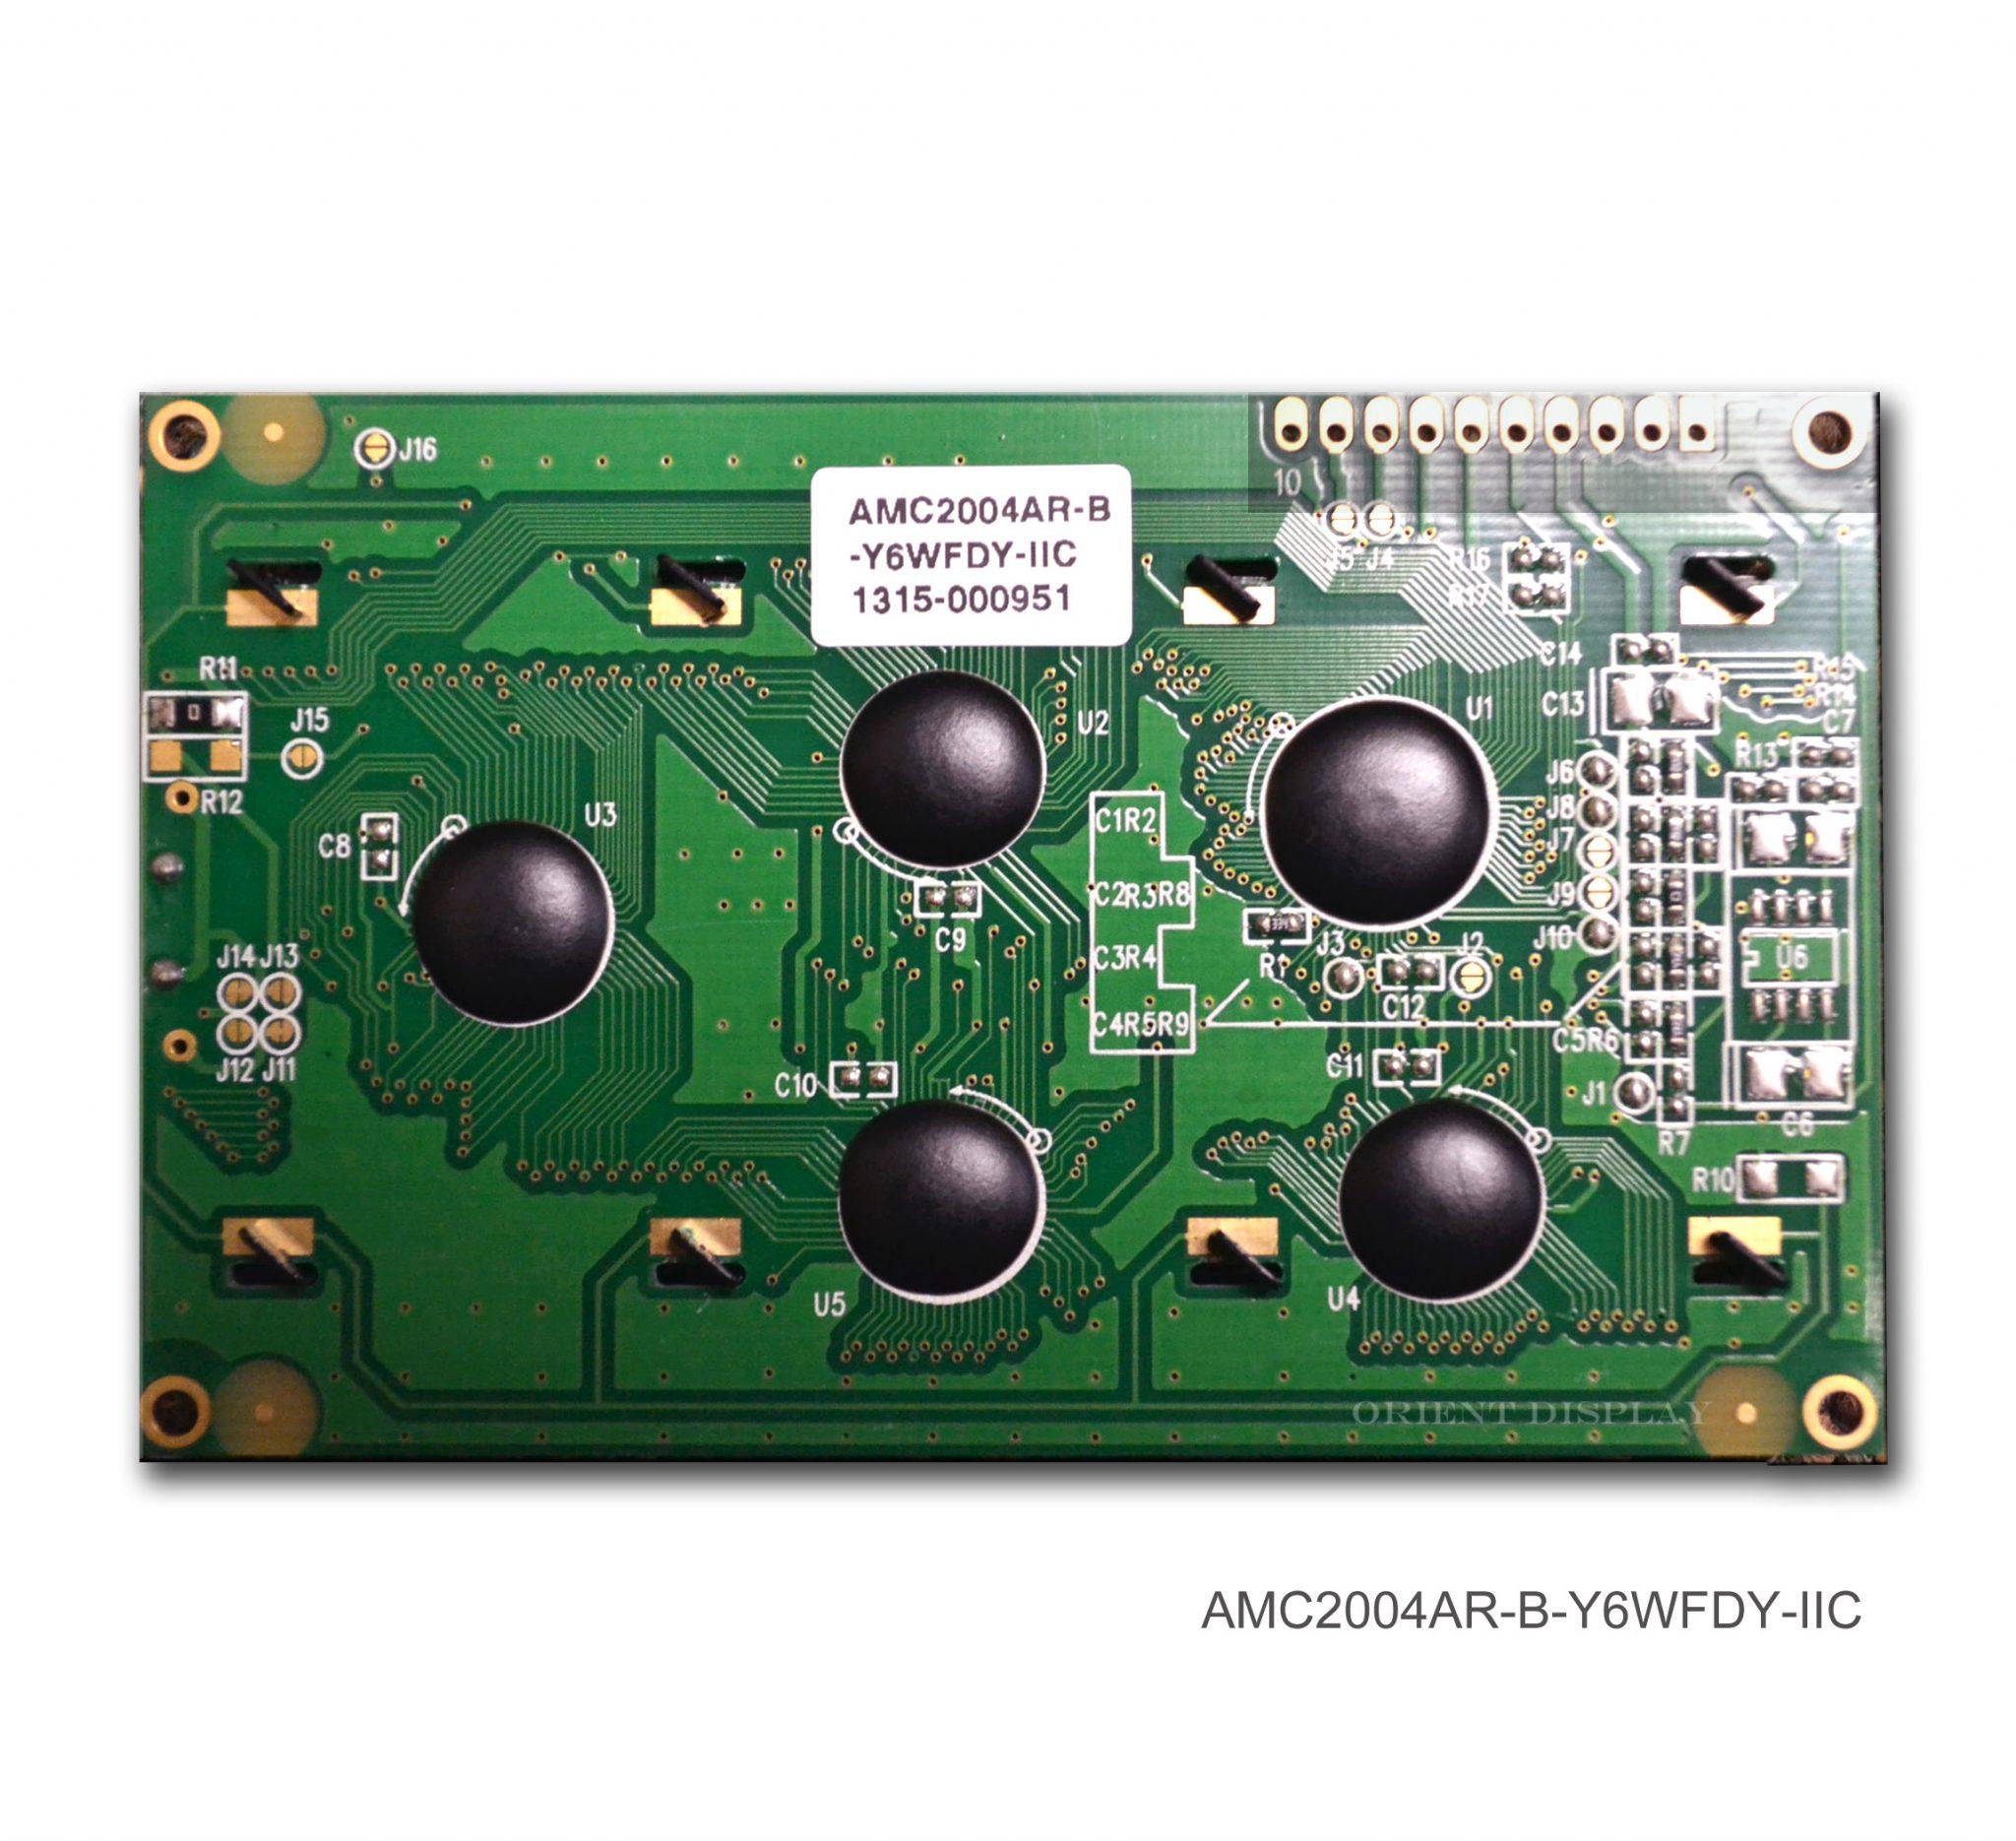 AMC2004AR-B-Y6WFDY-I2C (20x4 Character LCD Module - I2C Interface)